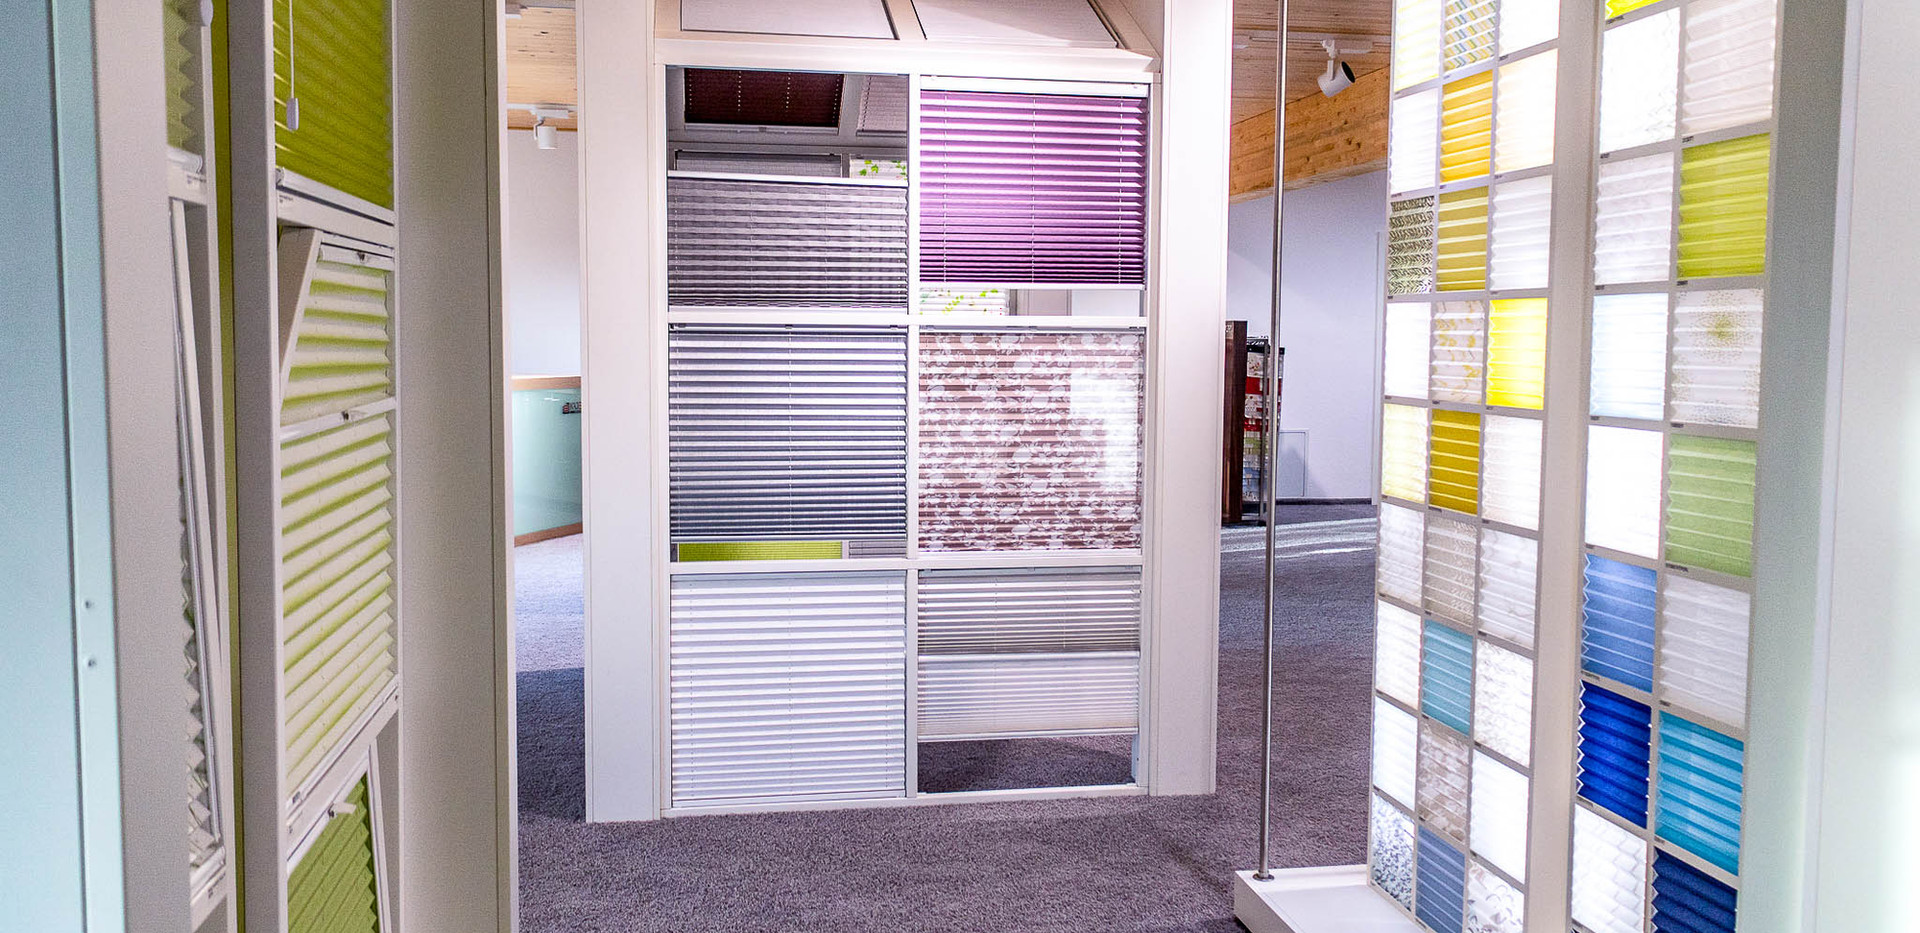 Raumstudio Pätzholz | Parkett, Bodenleger in Singen & Konstanz am Bodensee